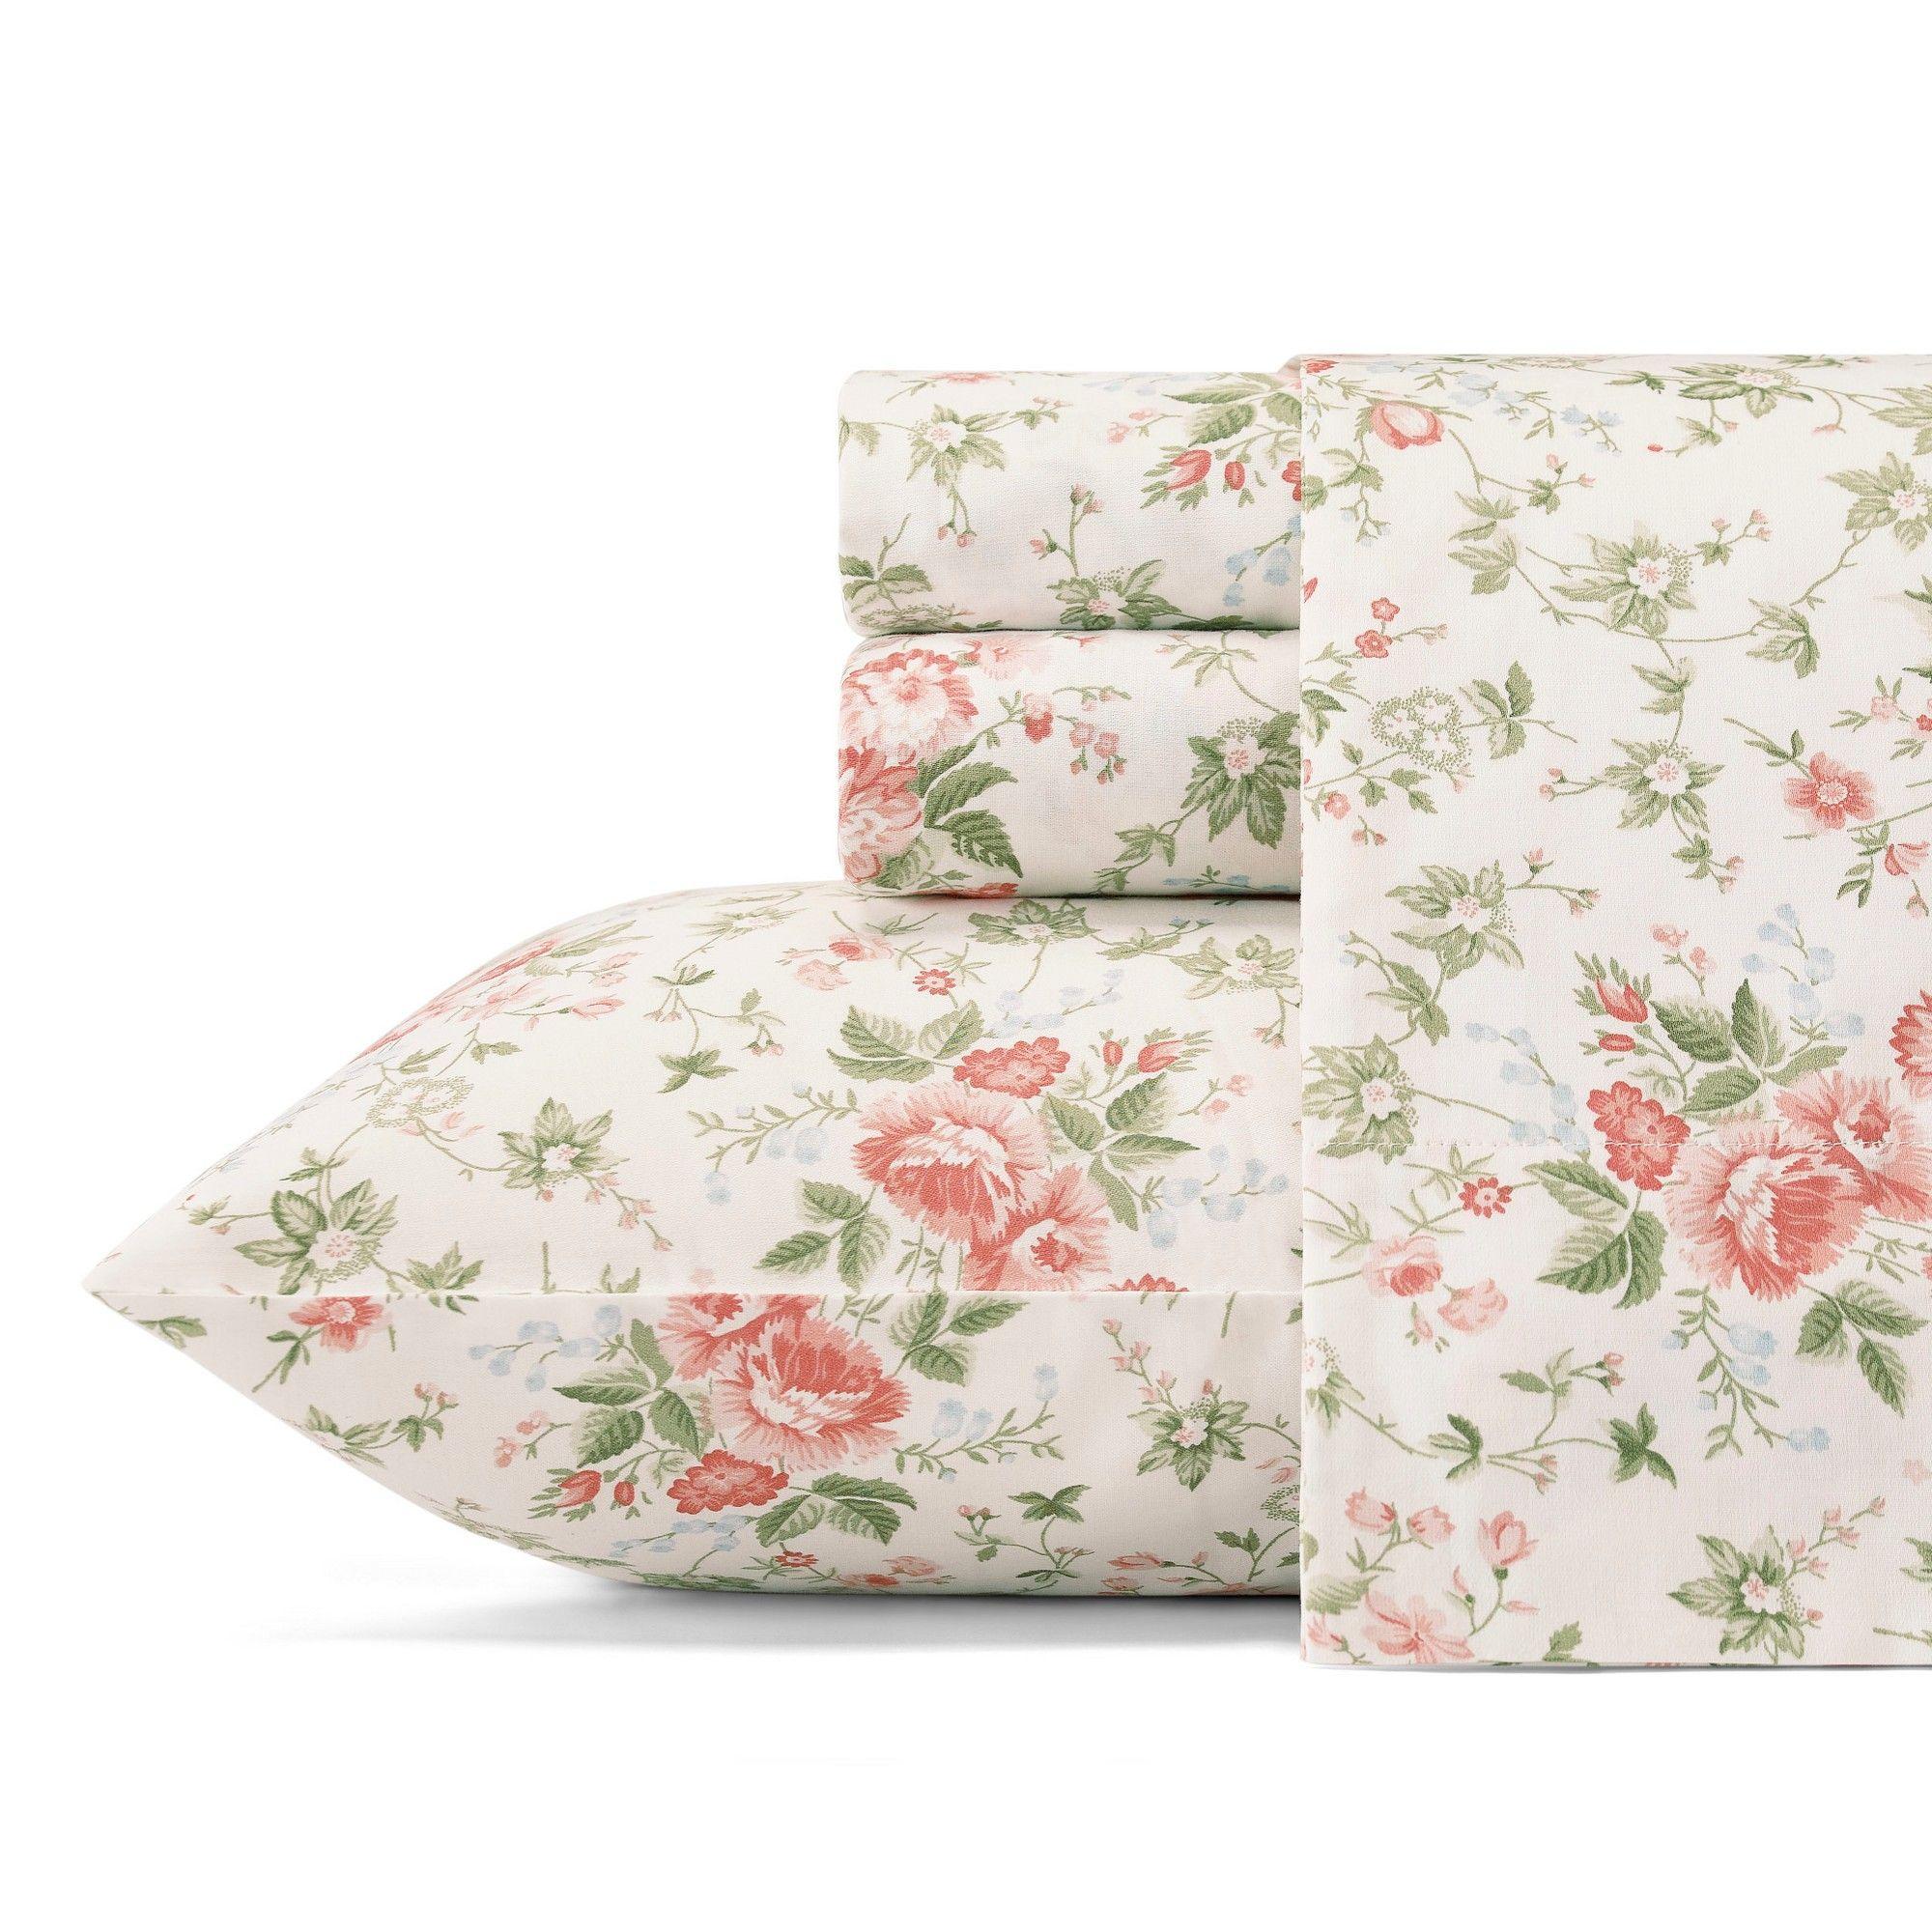 Cotton lilian thread count sheet set queen light pastel red